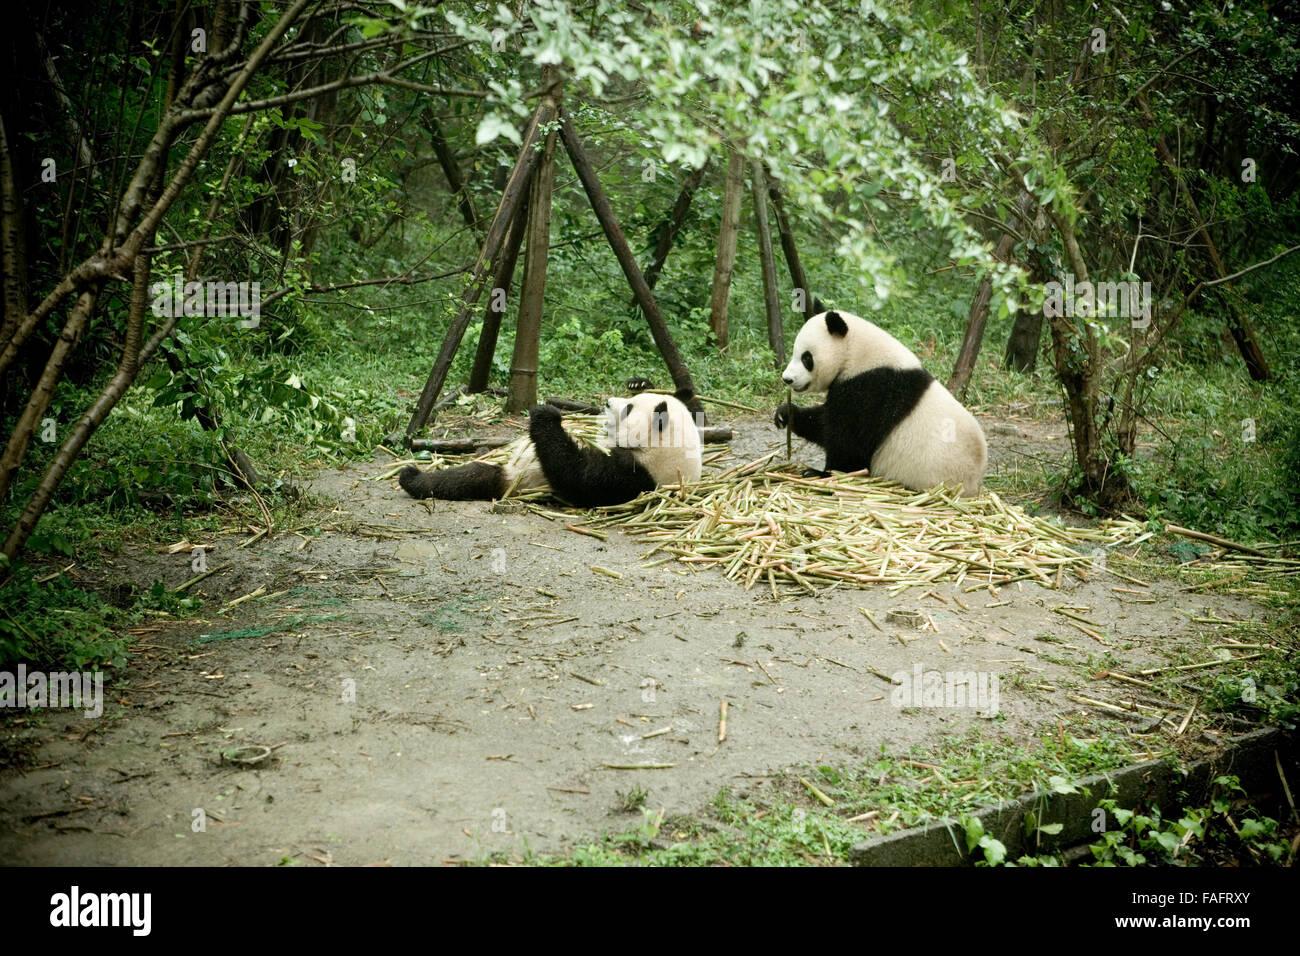 A Paar Riesenpanda Geniessen Essen Bambus In Das Panda Reservat In